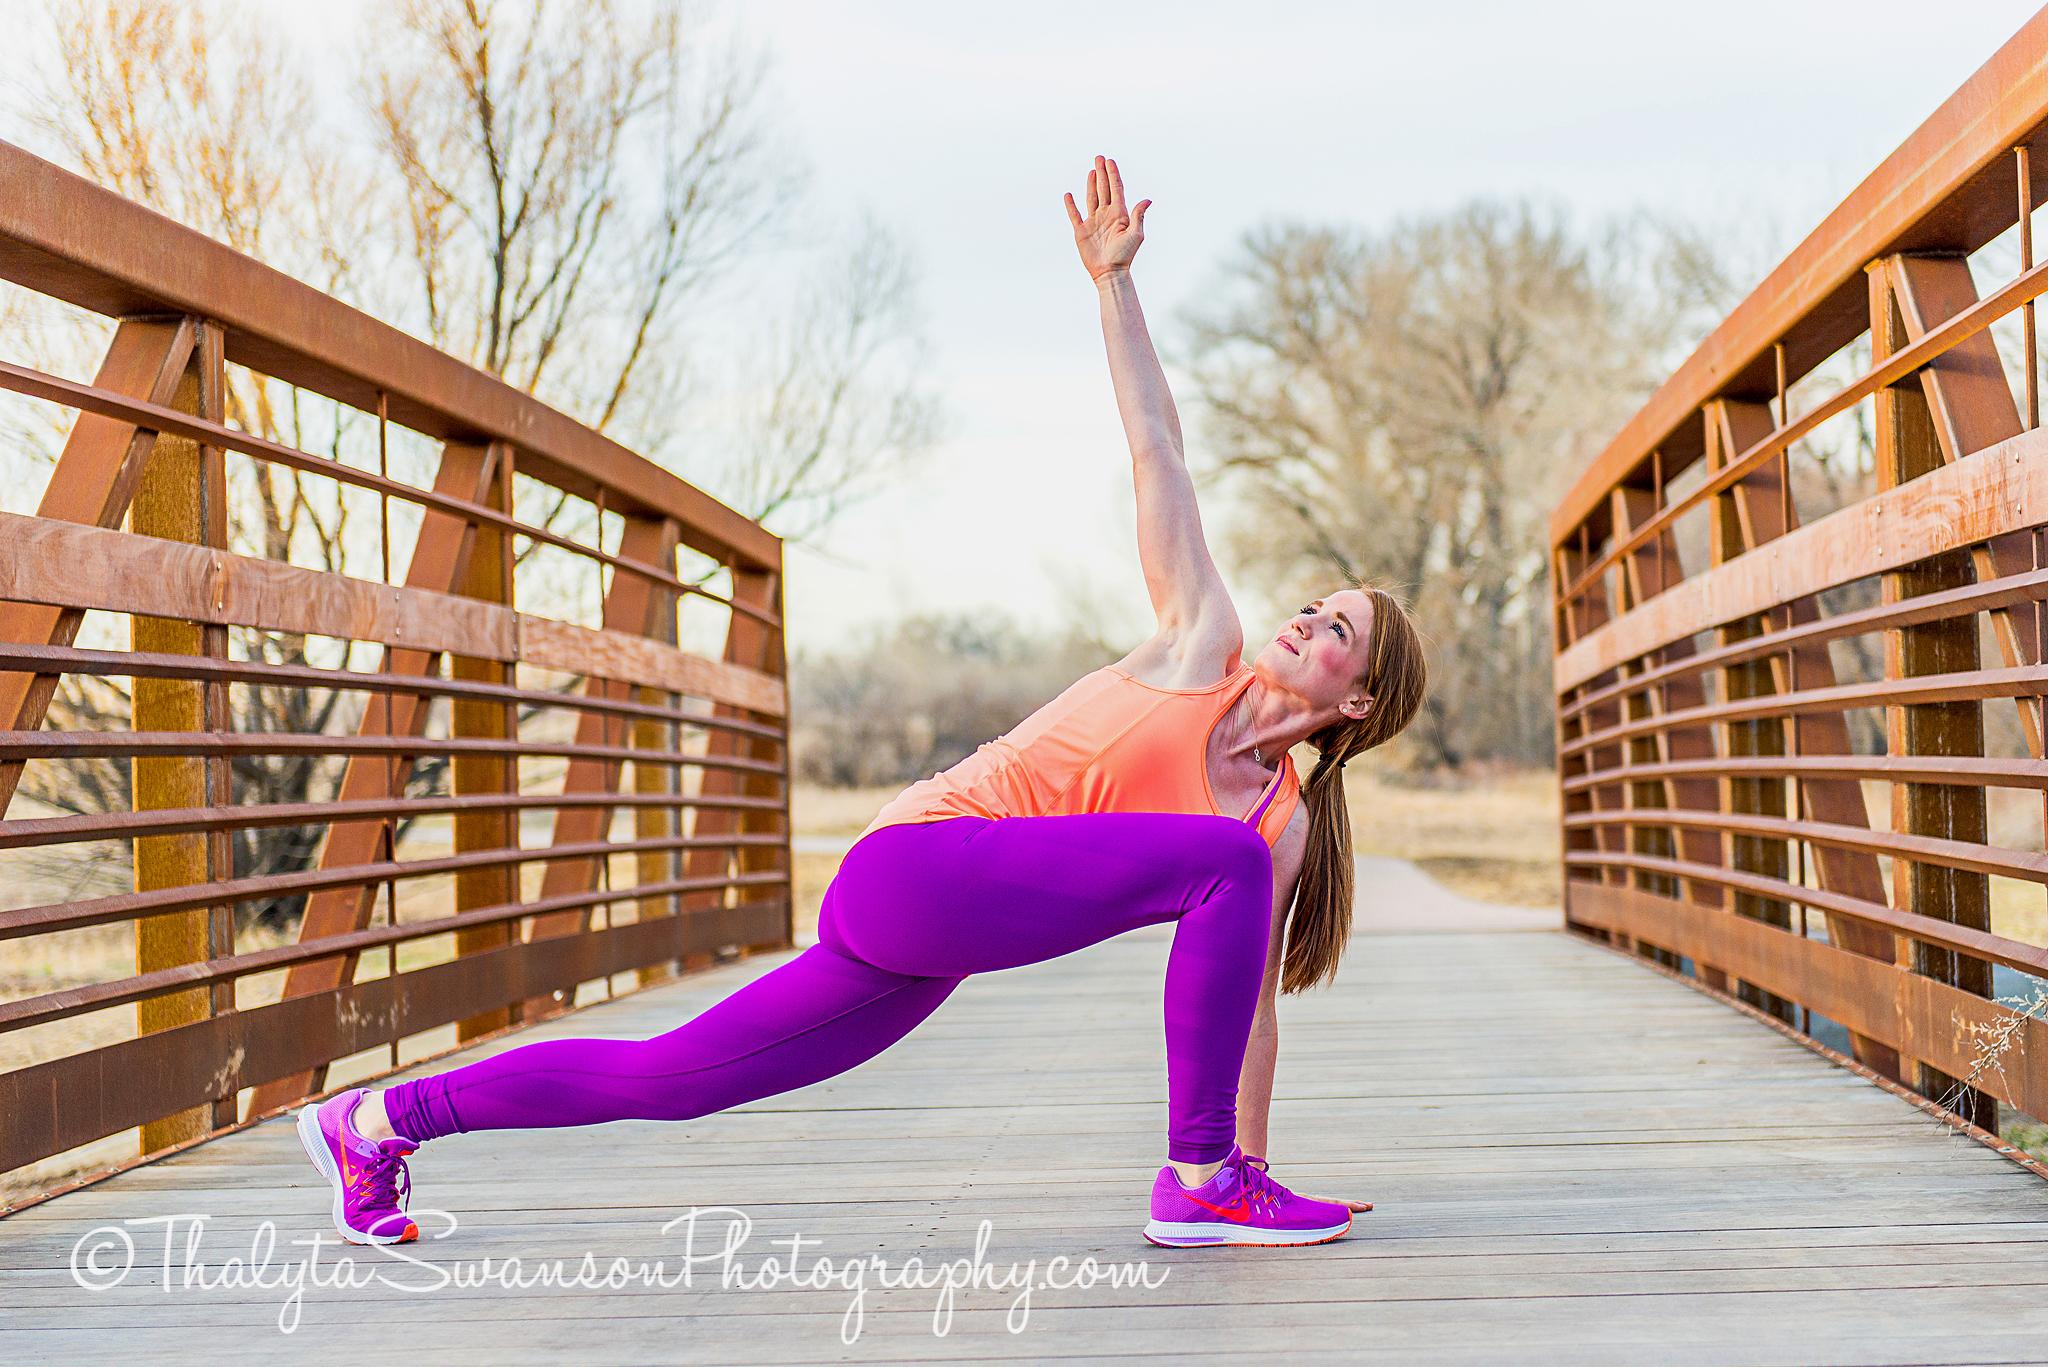 Thalyta Swanson Photography - Fitness Photos (7)